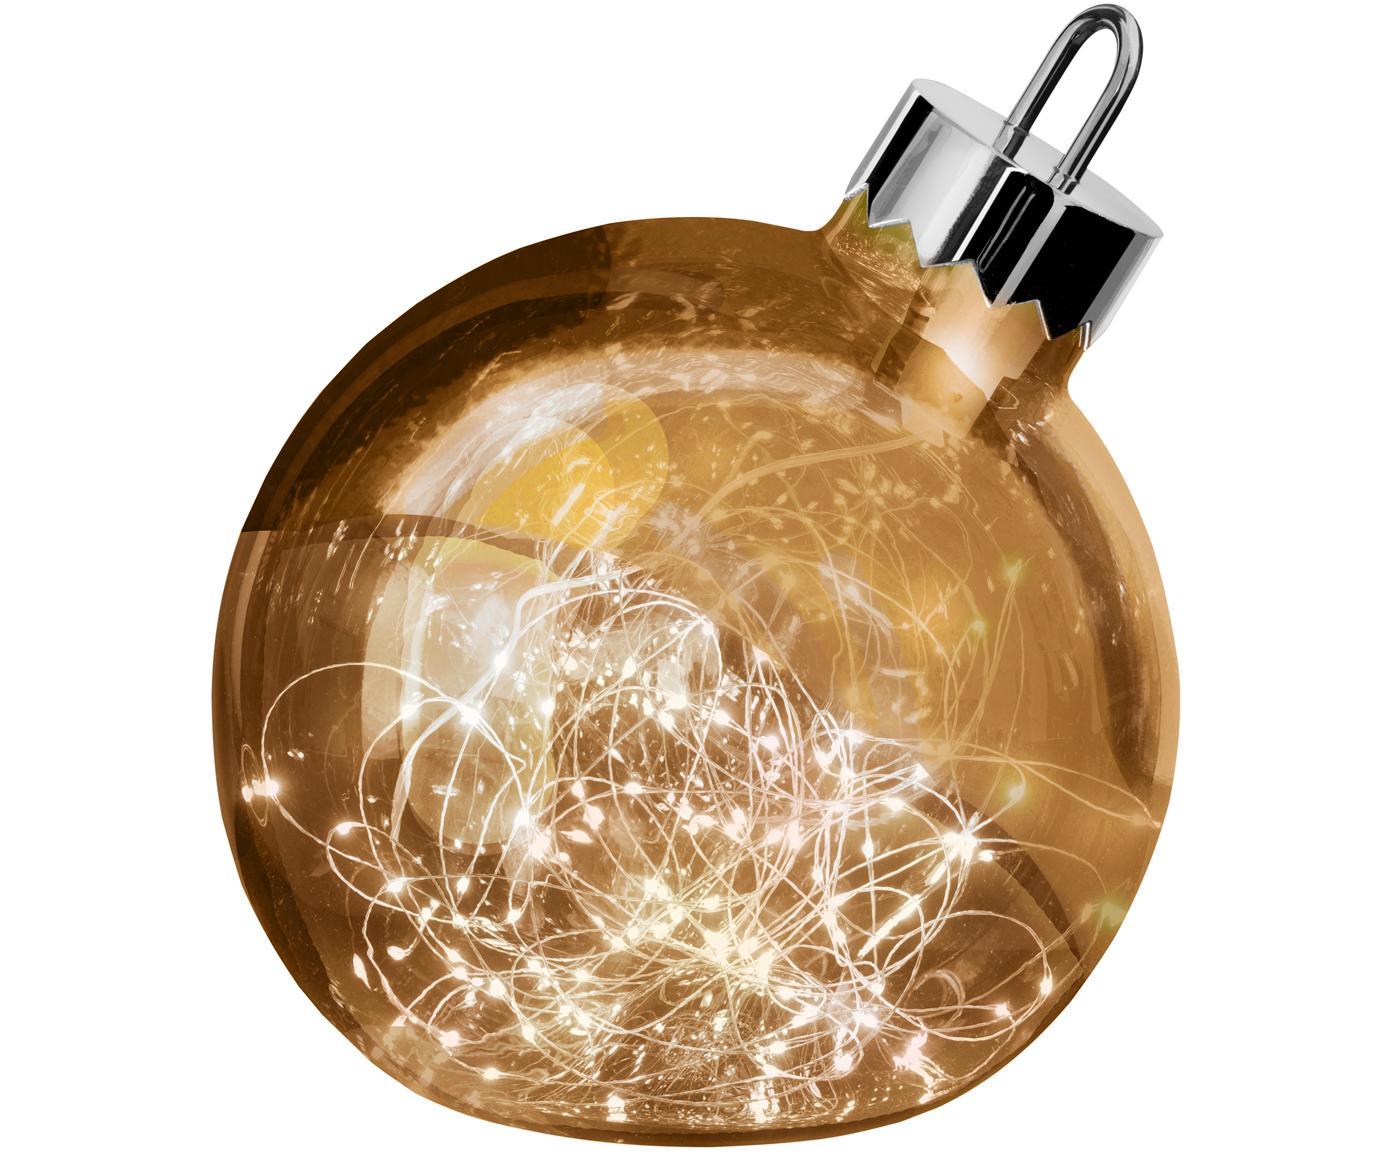 LED Leuchtobjekt Aggia, Messingfarben, Ø 20 x H 22 cm